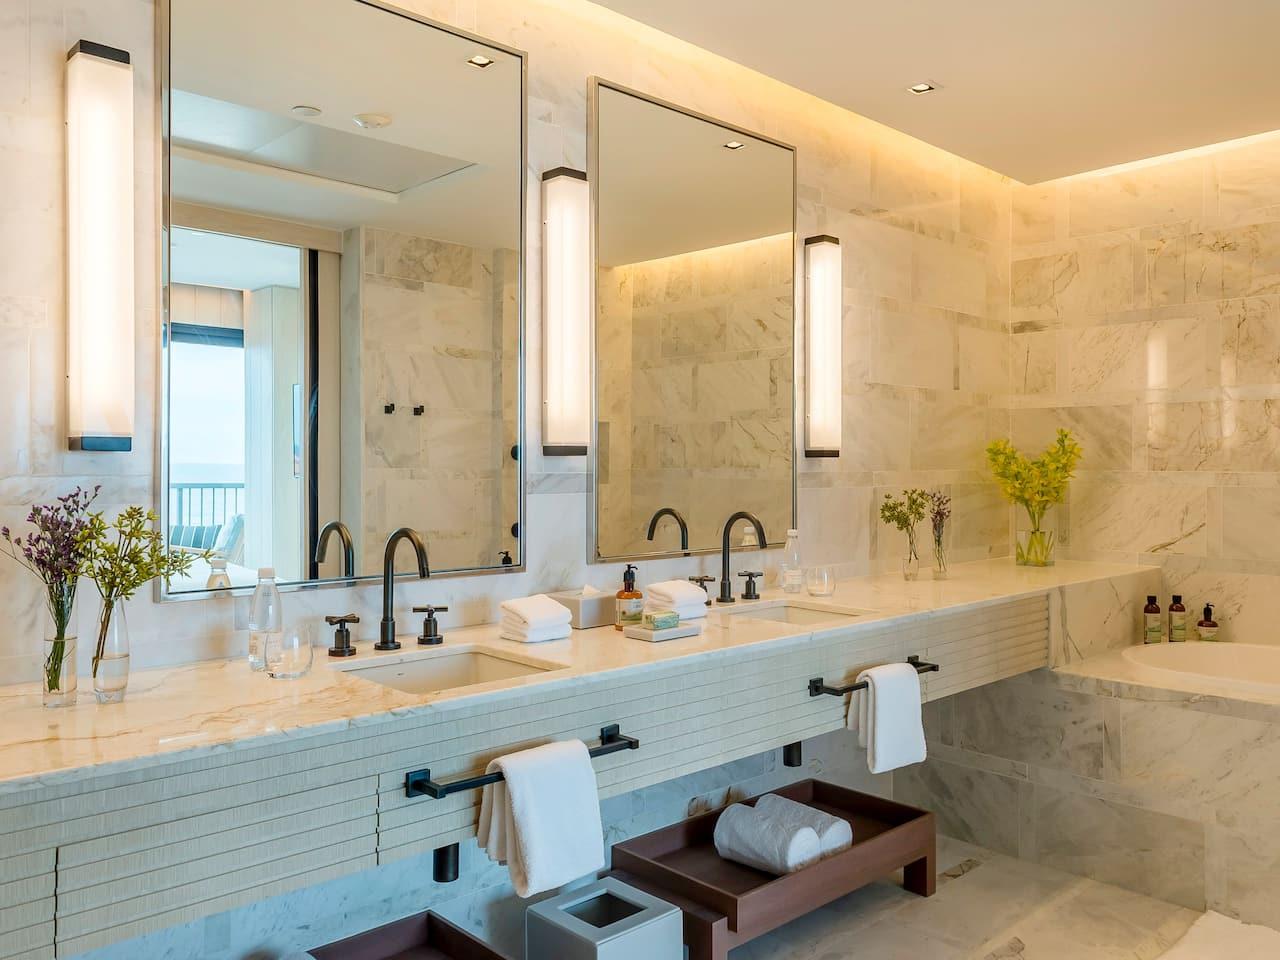 Grand Hyatt Rio de Janeiro | Diplomat Suite Bathroom